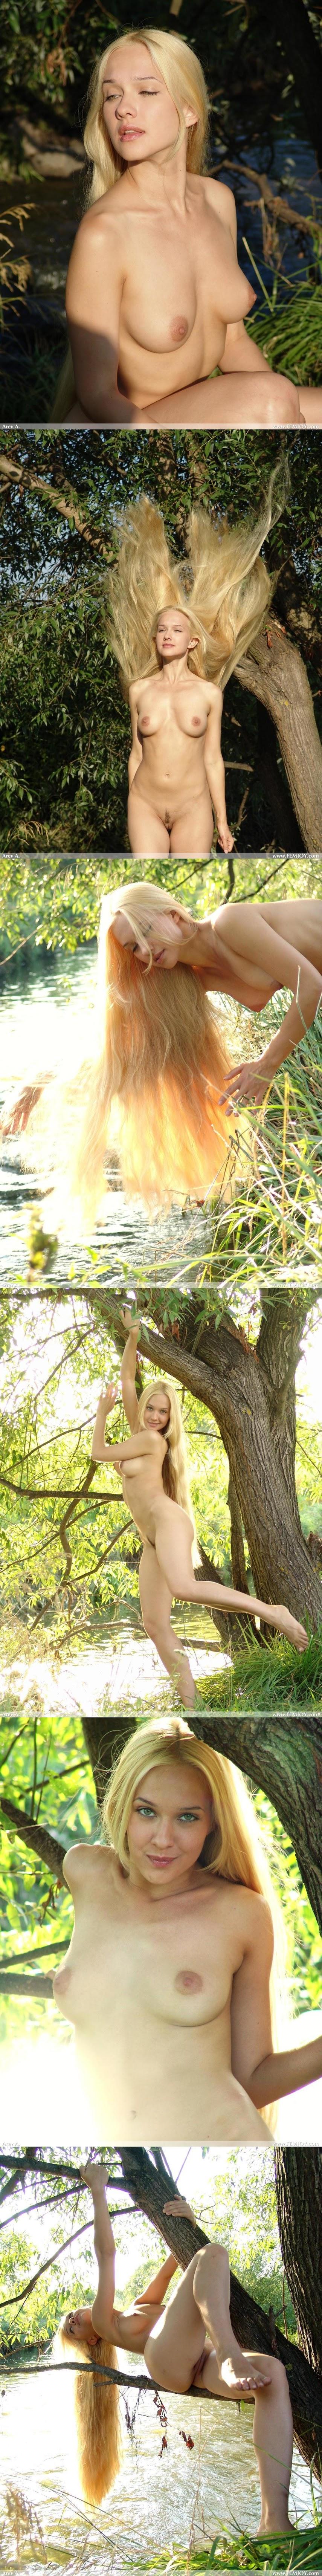 FEdf  - 2005-10-03 - Mira - Timber Lake x70 3000pxReal Street Angels